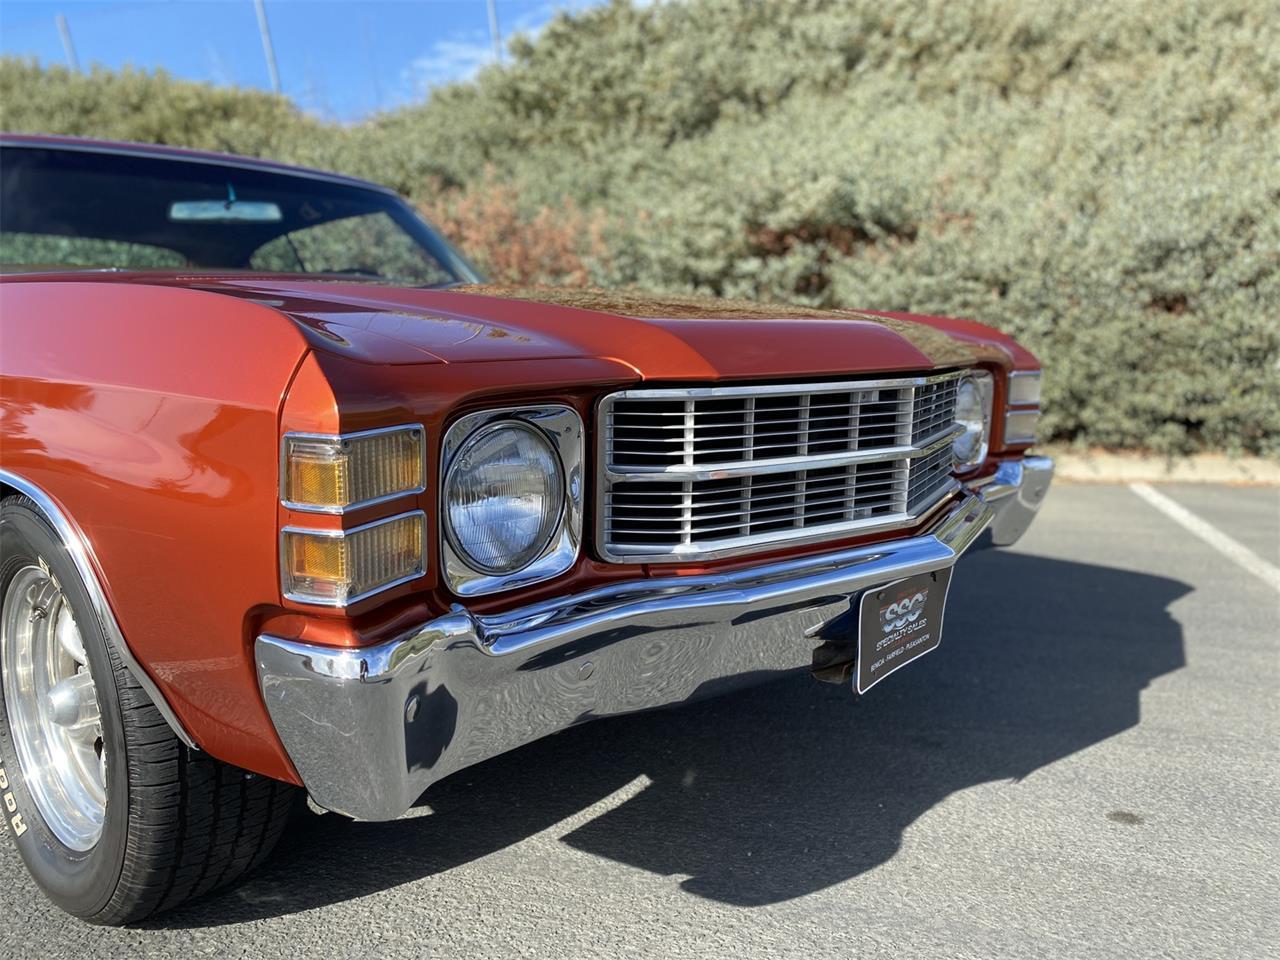 1971 Chevrolet Chevelle (CC-1423604) for sale in Fairfield, California